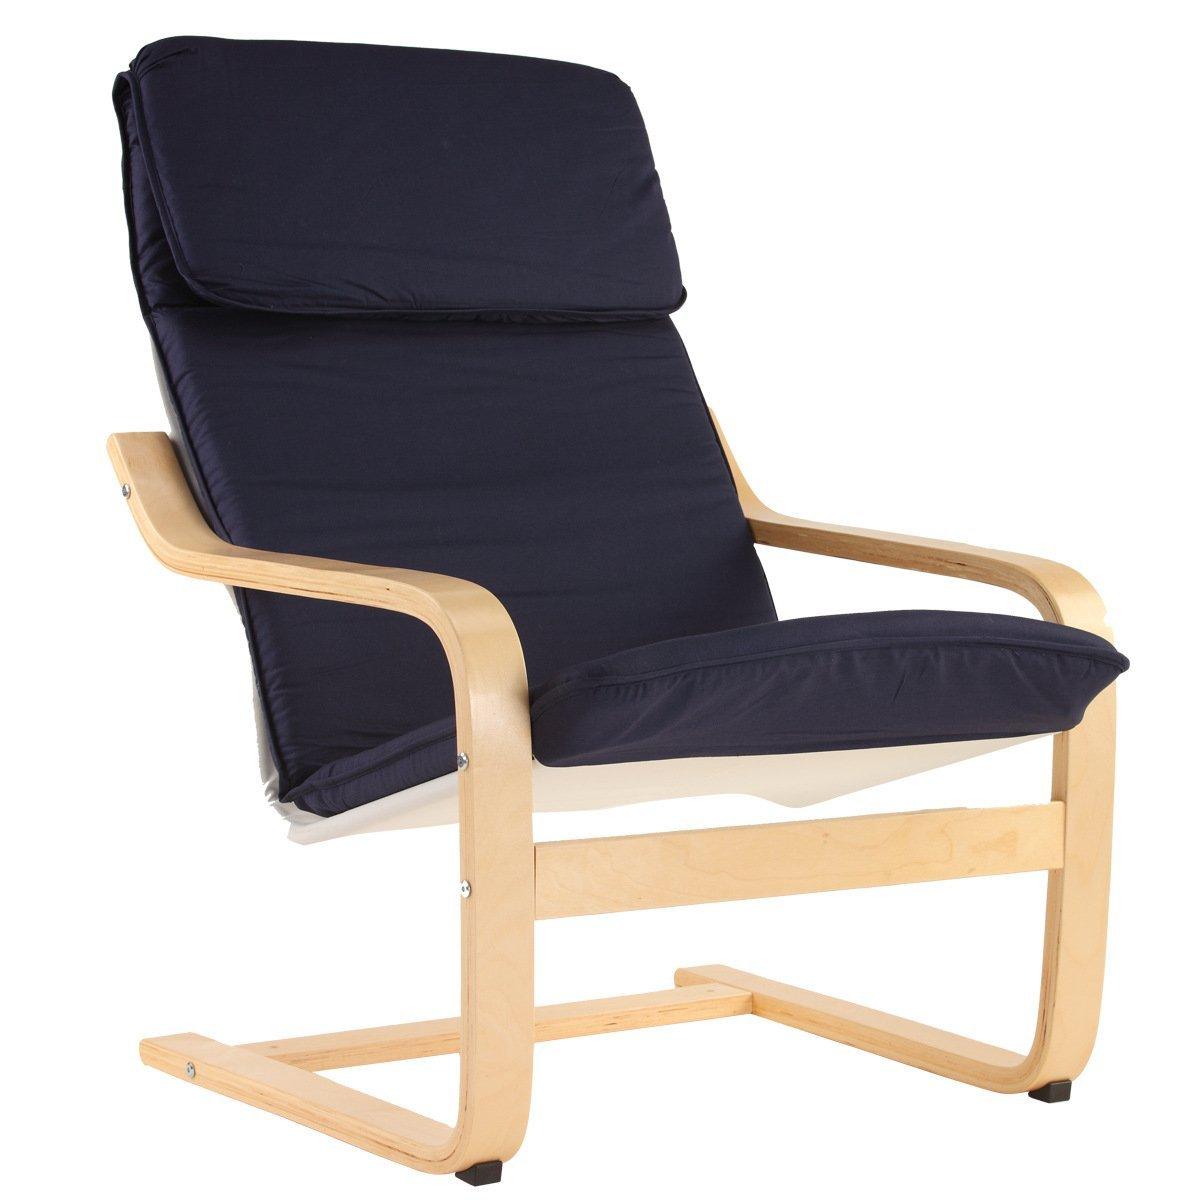 baby sofa chair malaysia sectional sofas microfiber wooden leisure armchair sponge cushi end 8 21 2020 1 39 pm